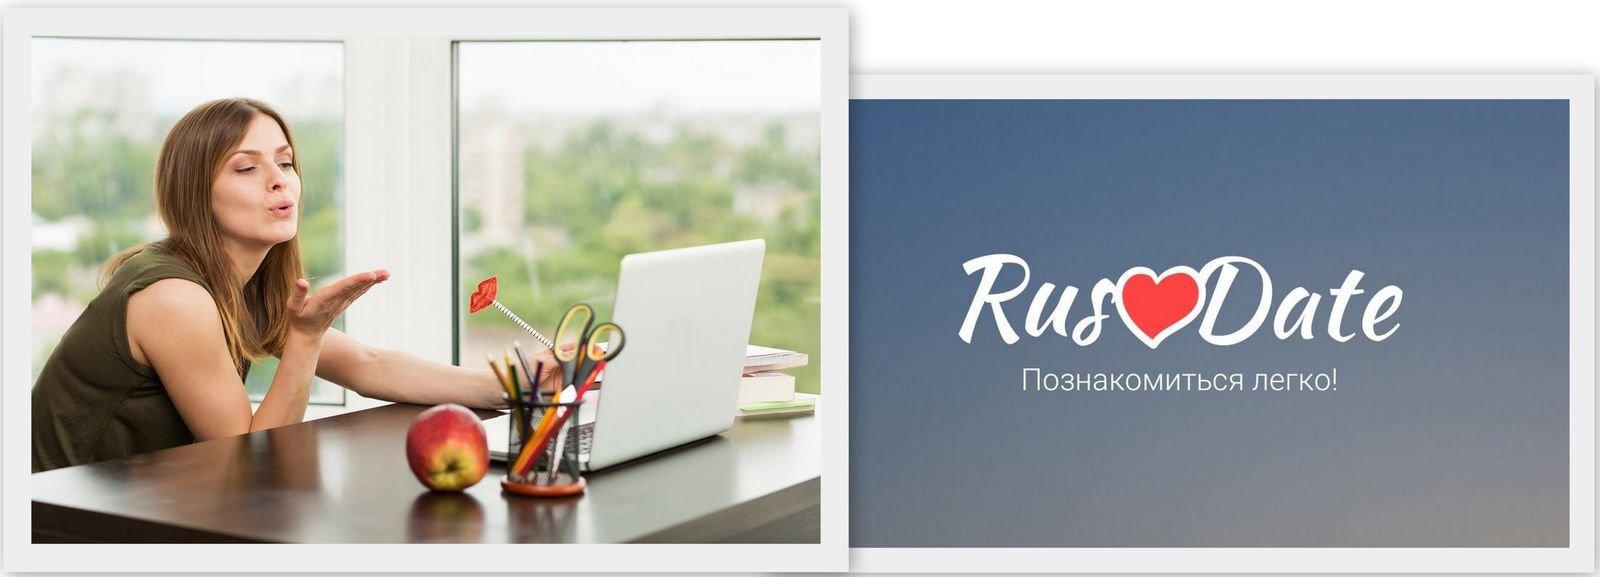 Знакомства в Укране на сайте RusDate